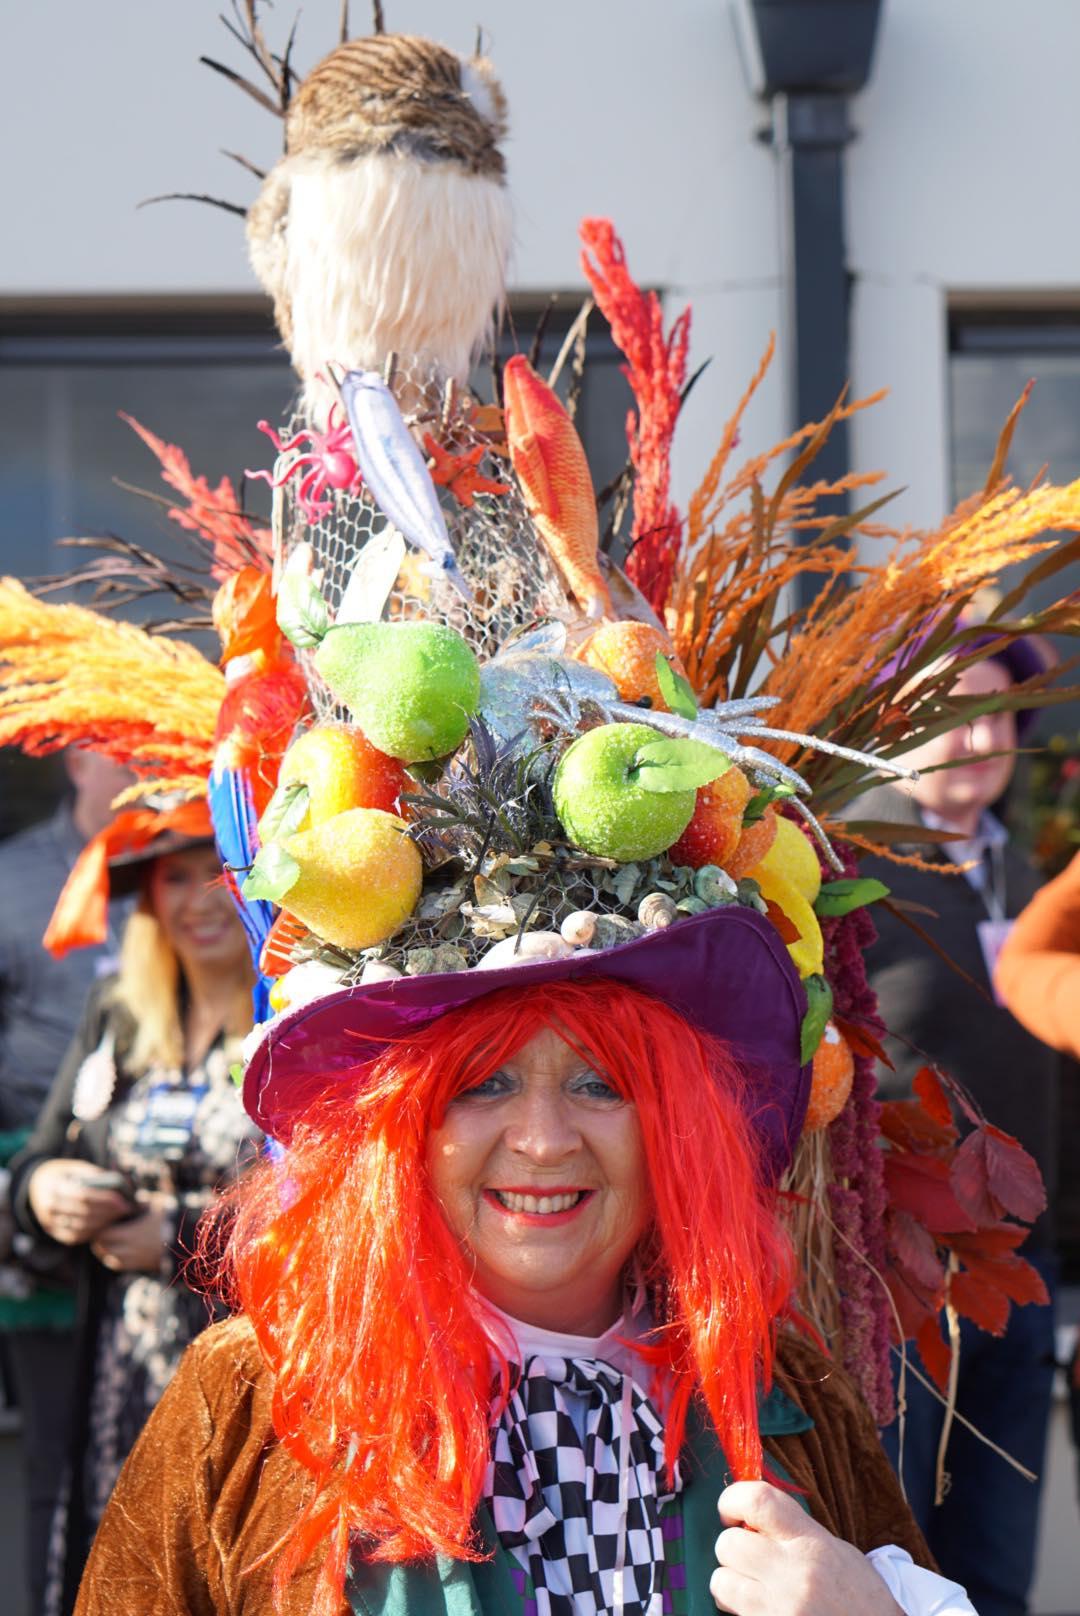 Mad Hatters Taste of Kinsale Festival, Kinsale. Elk jaar bereiden de inwoners van Kinsale zich al maanden voor op het Mad Hatters Taste of Kinsale Festival in oktober.